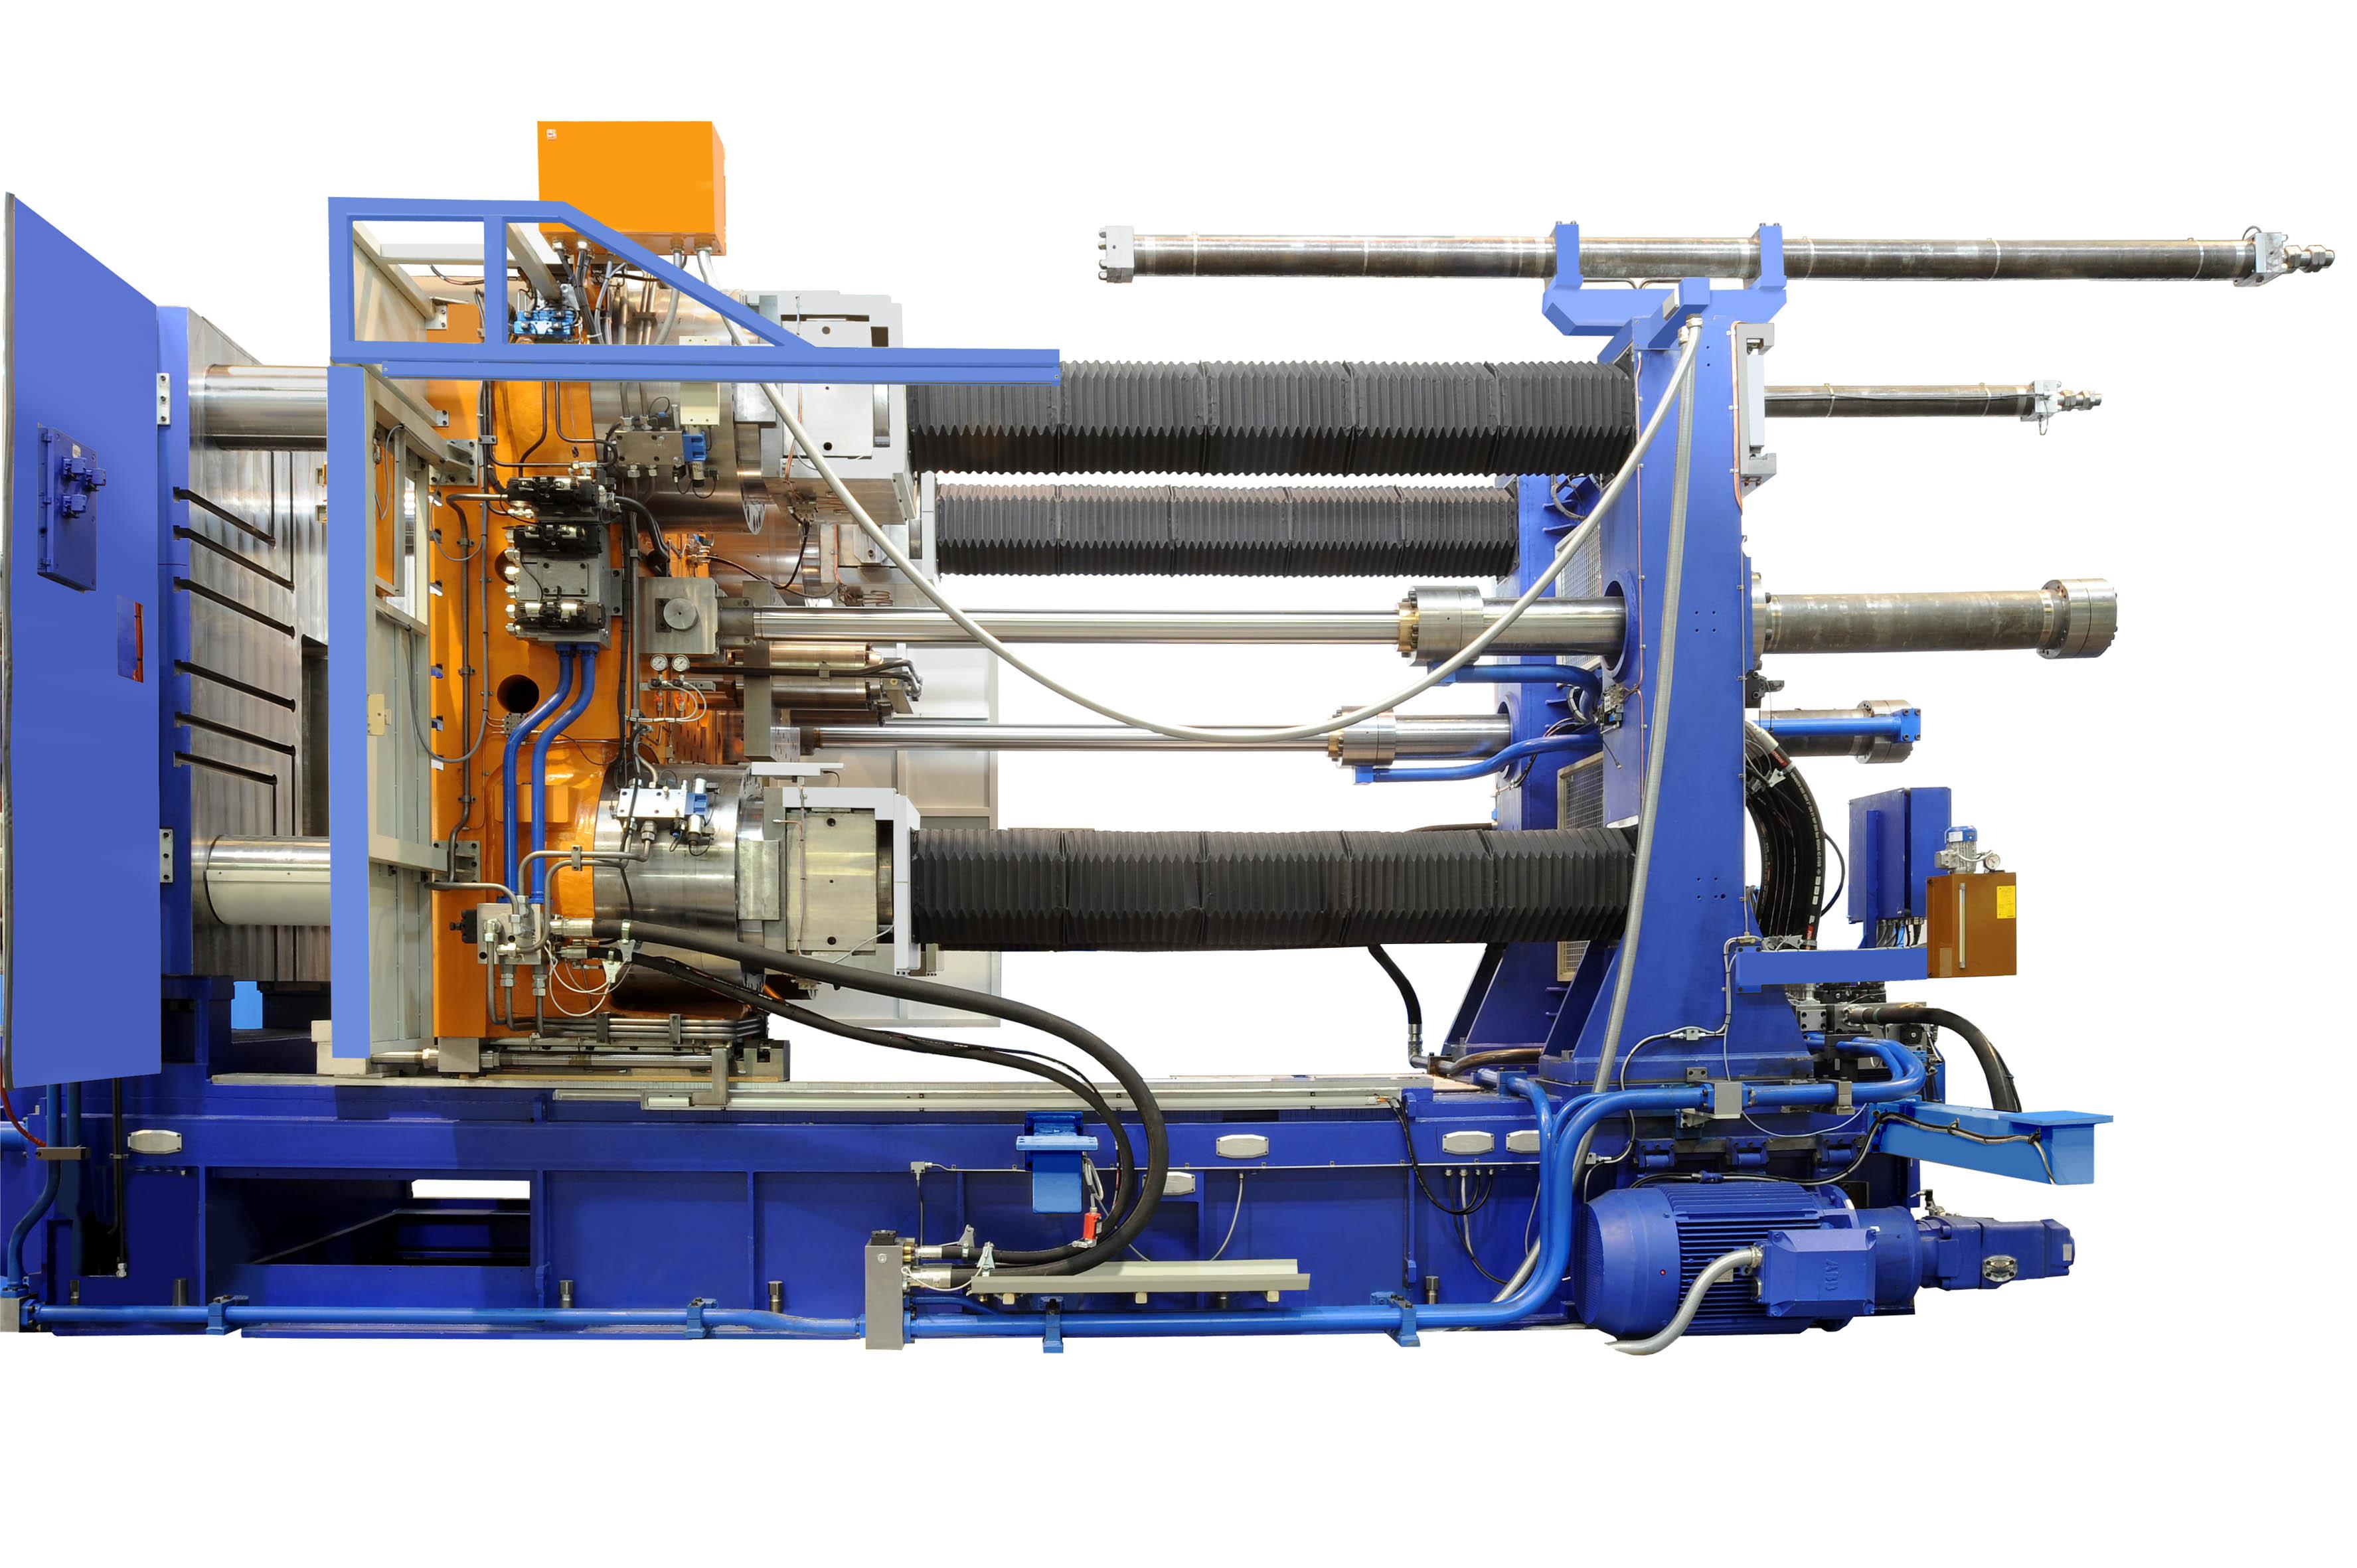 Fig 2:High pressures die casting (Italpresse Industrie S.p.A.)